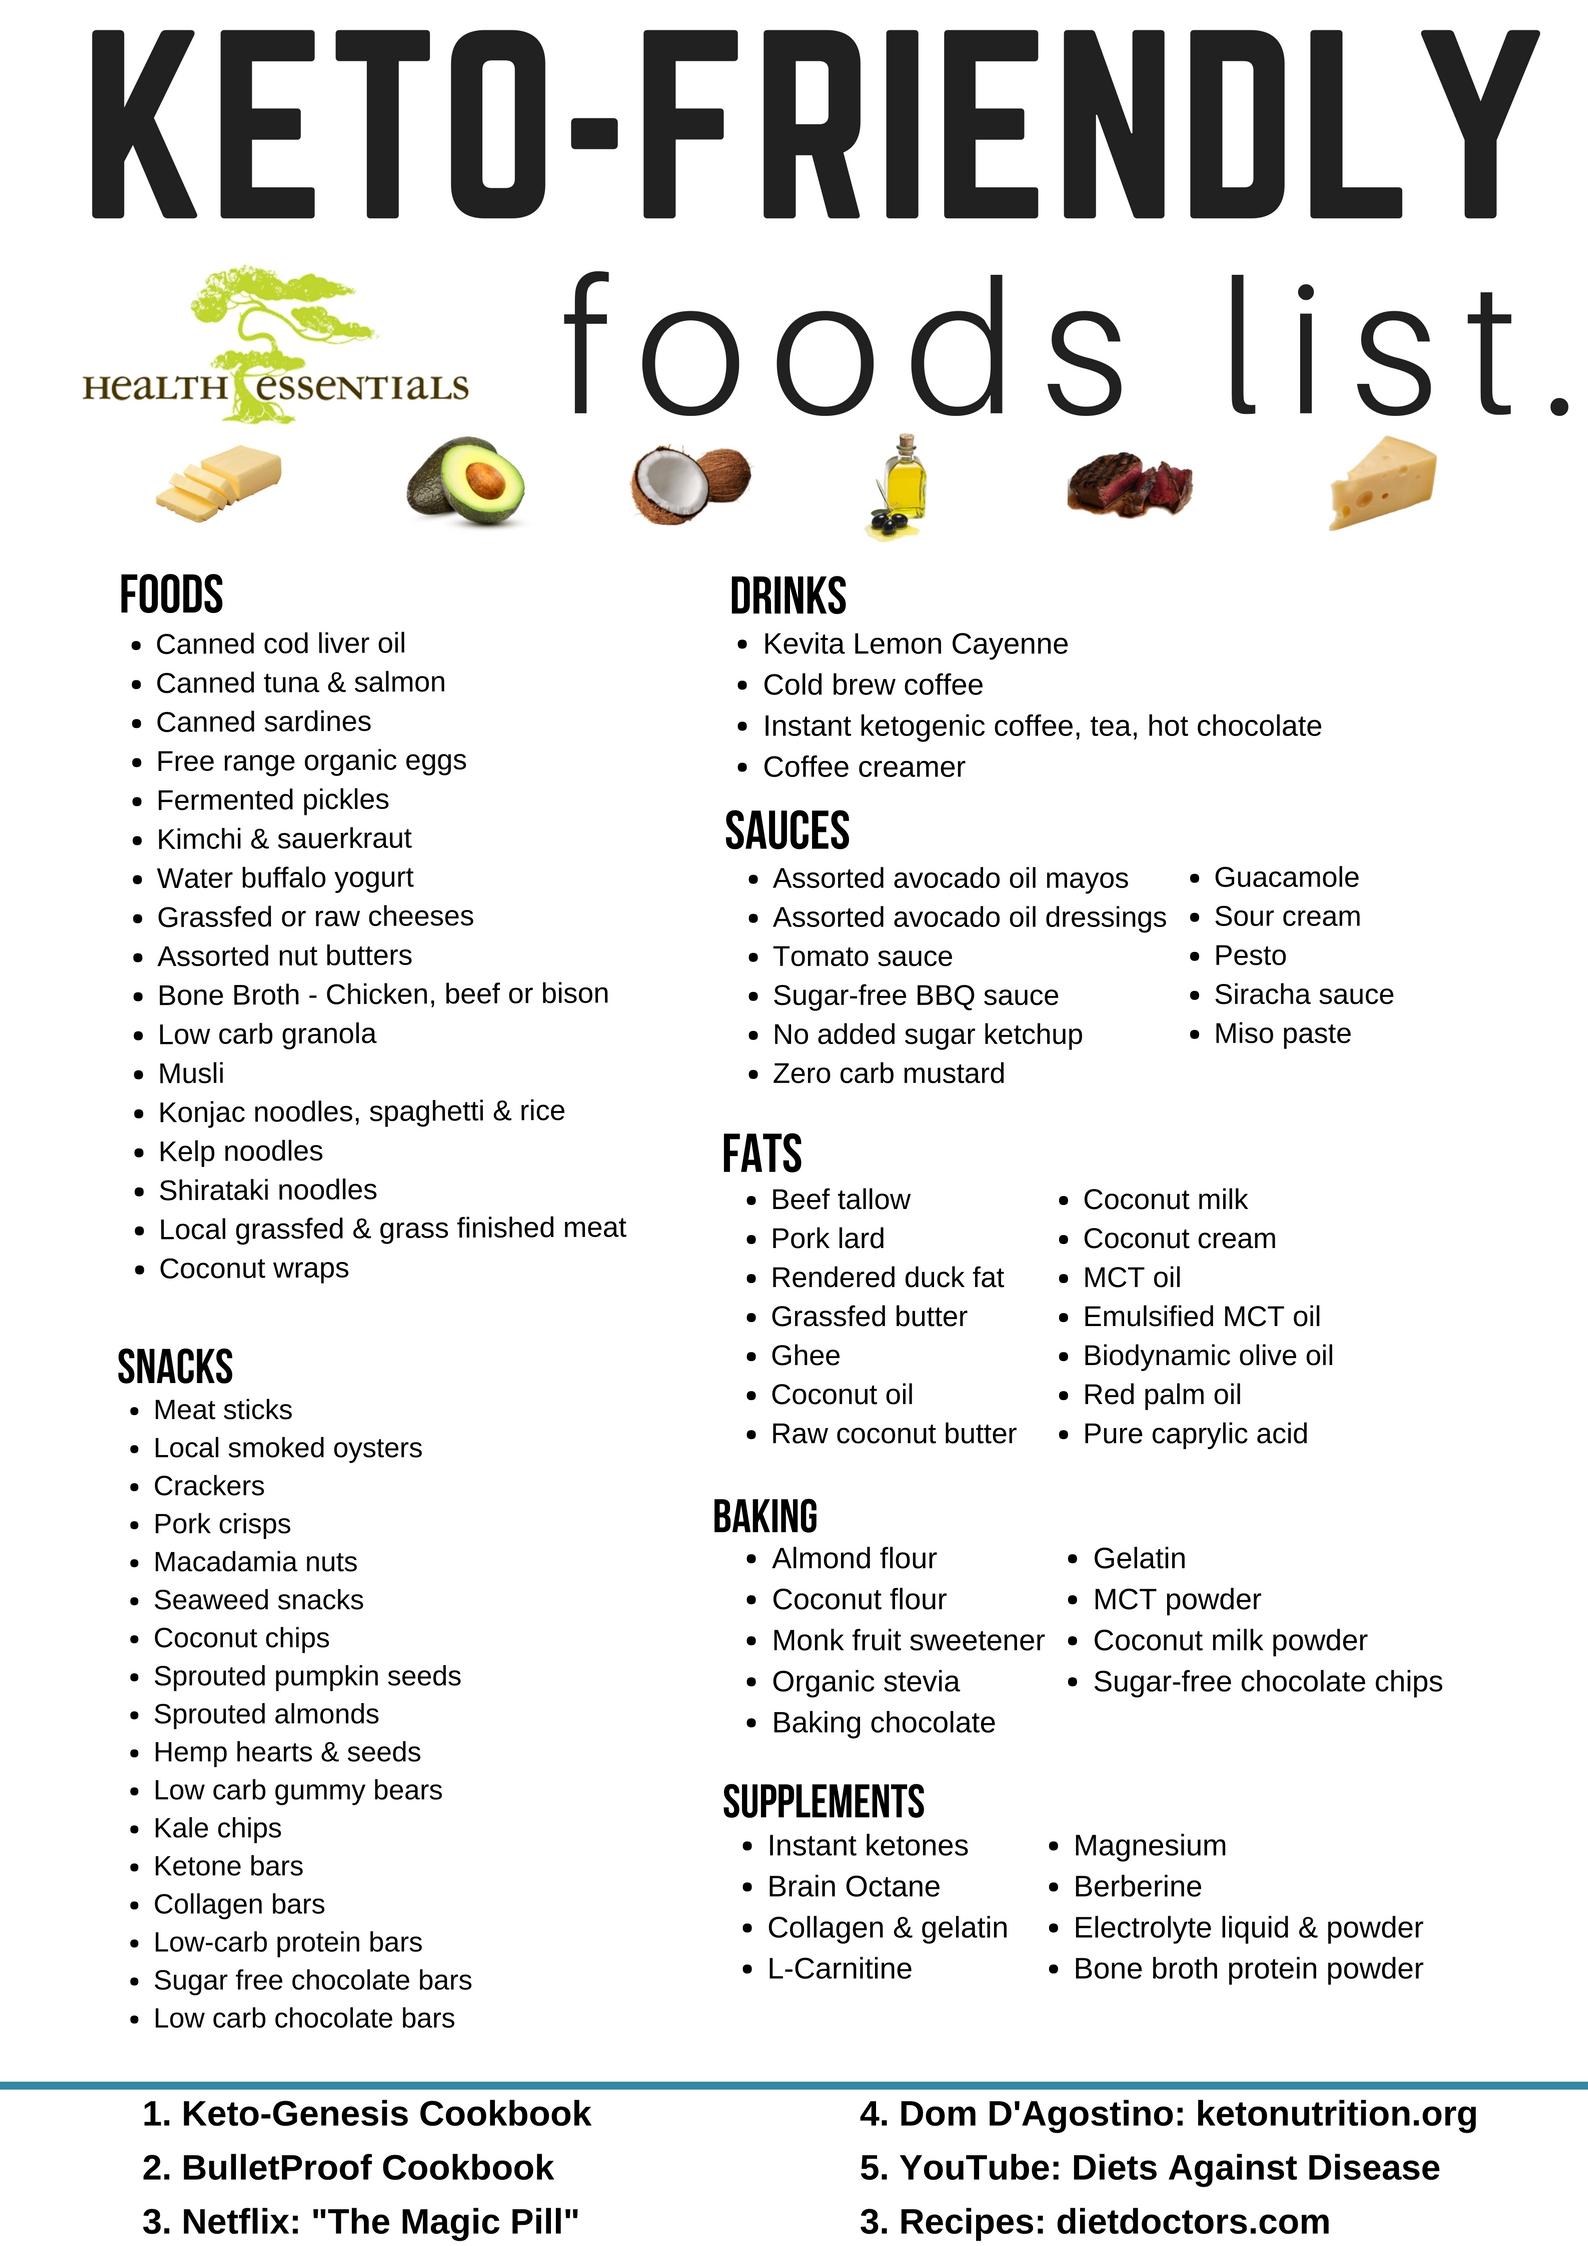 KetoGenic-Foods.jpg